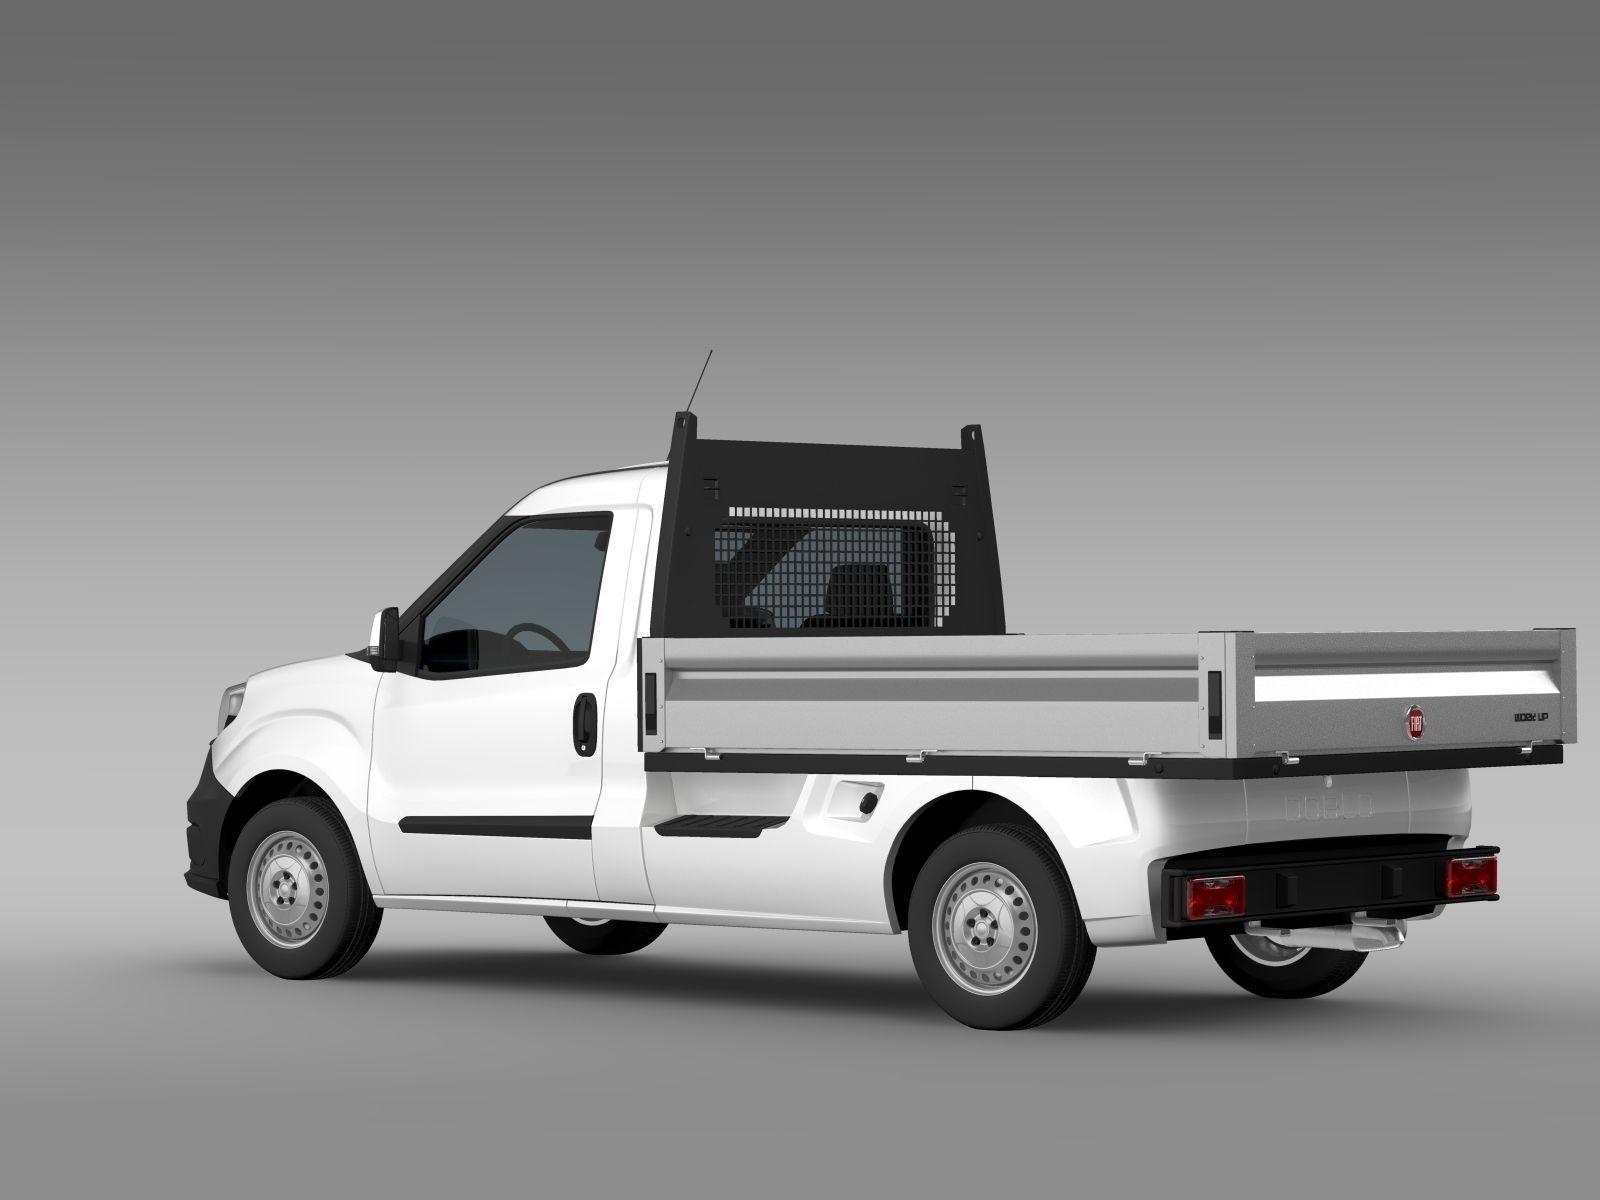 Fiat Doblo Work Up 263 2017 3d Cgtrader Pickup Truck Model Max Obj Mtl 3ds Fbx C4d Lwo Lw